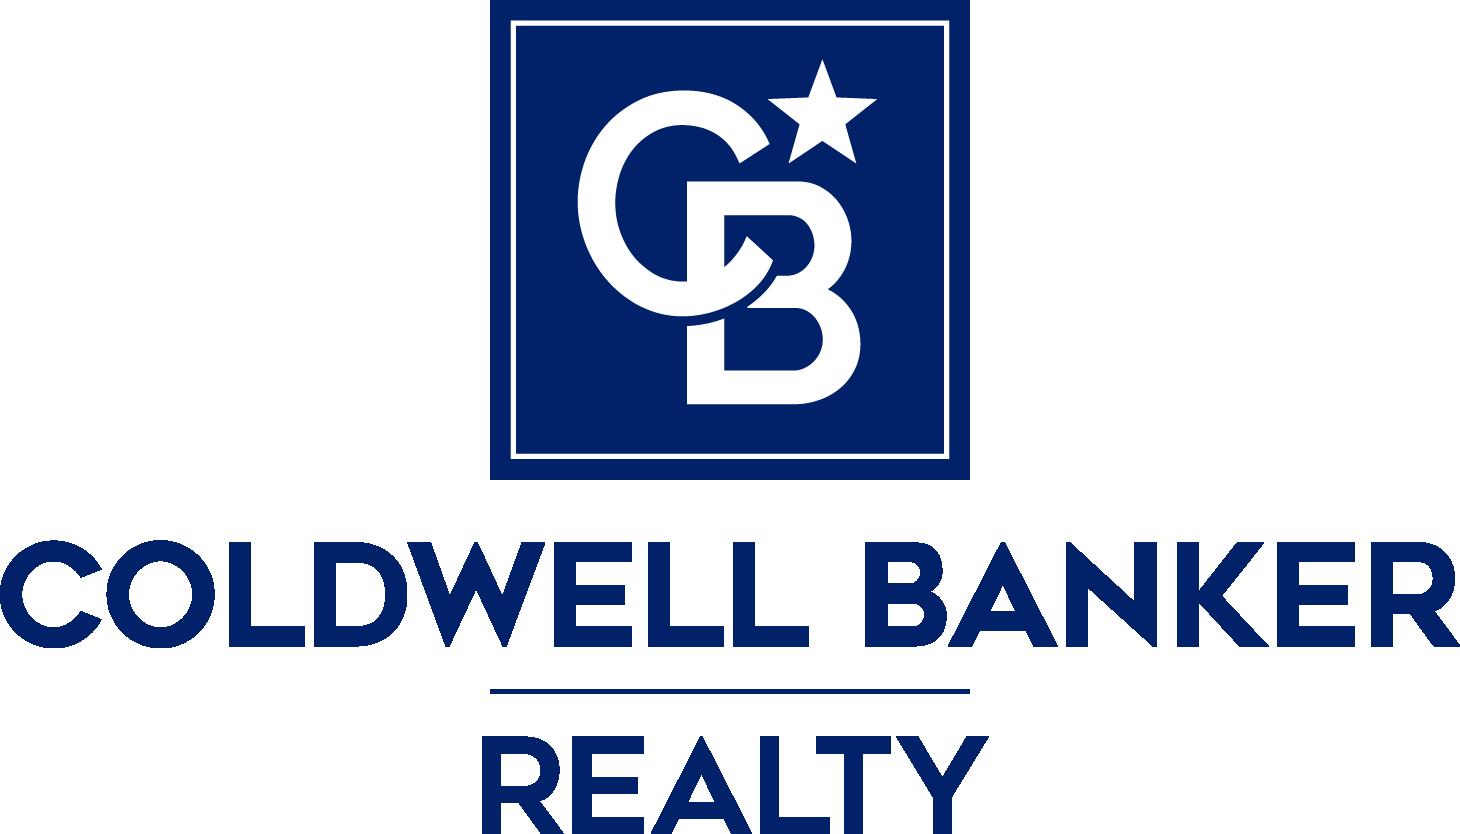 CB_Logo_RGB_Vertical_Realty@3x